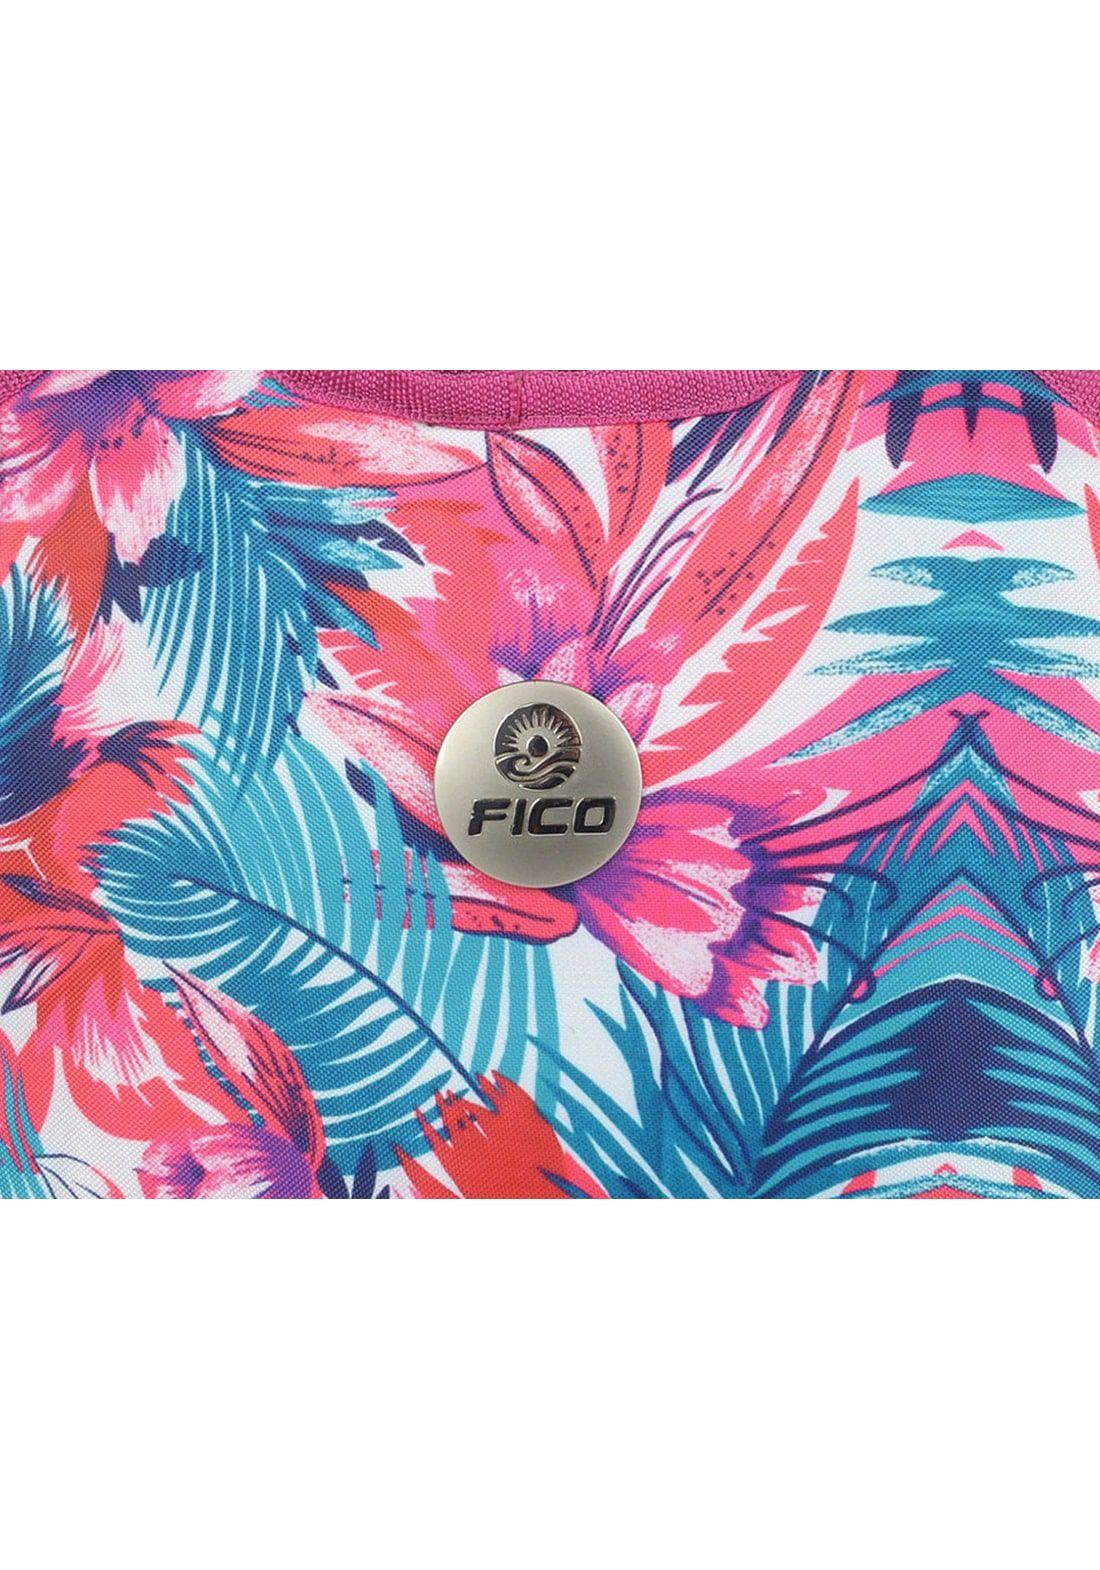 Lancheira Bolsa Térmica Neoprene Alça Transversal FICO Estampa Rosa e Azul